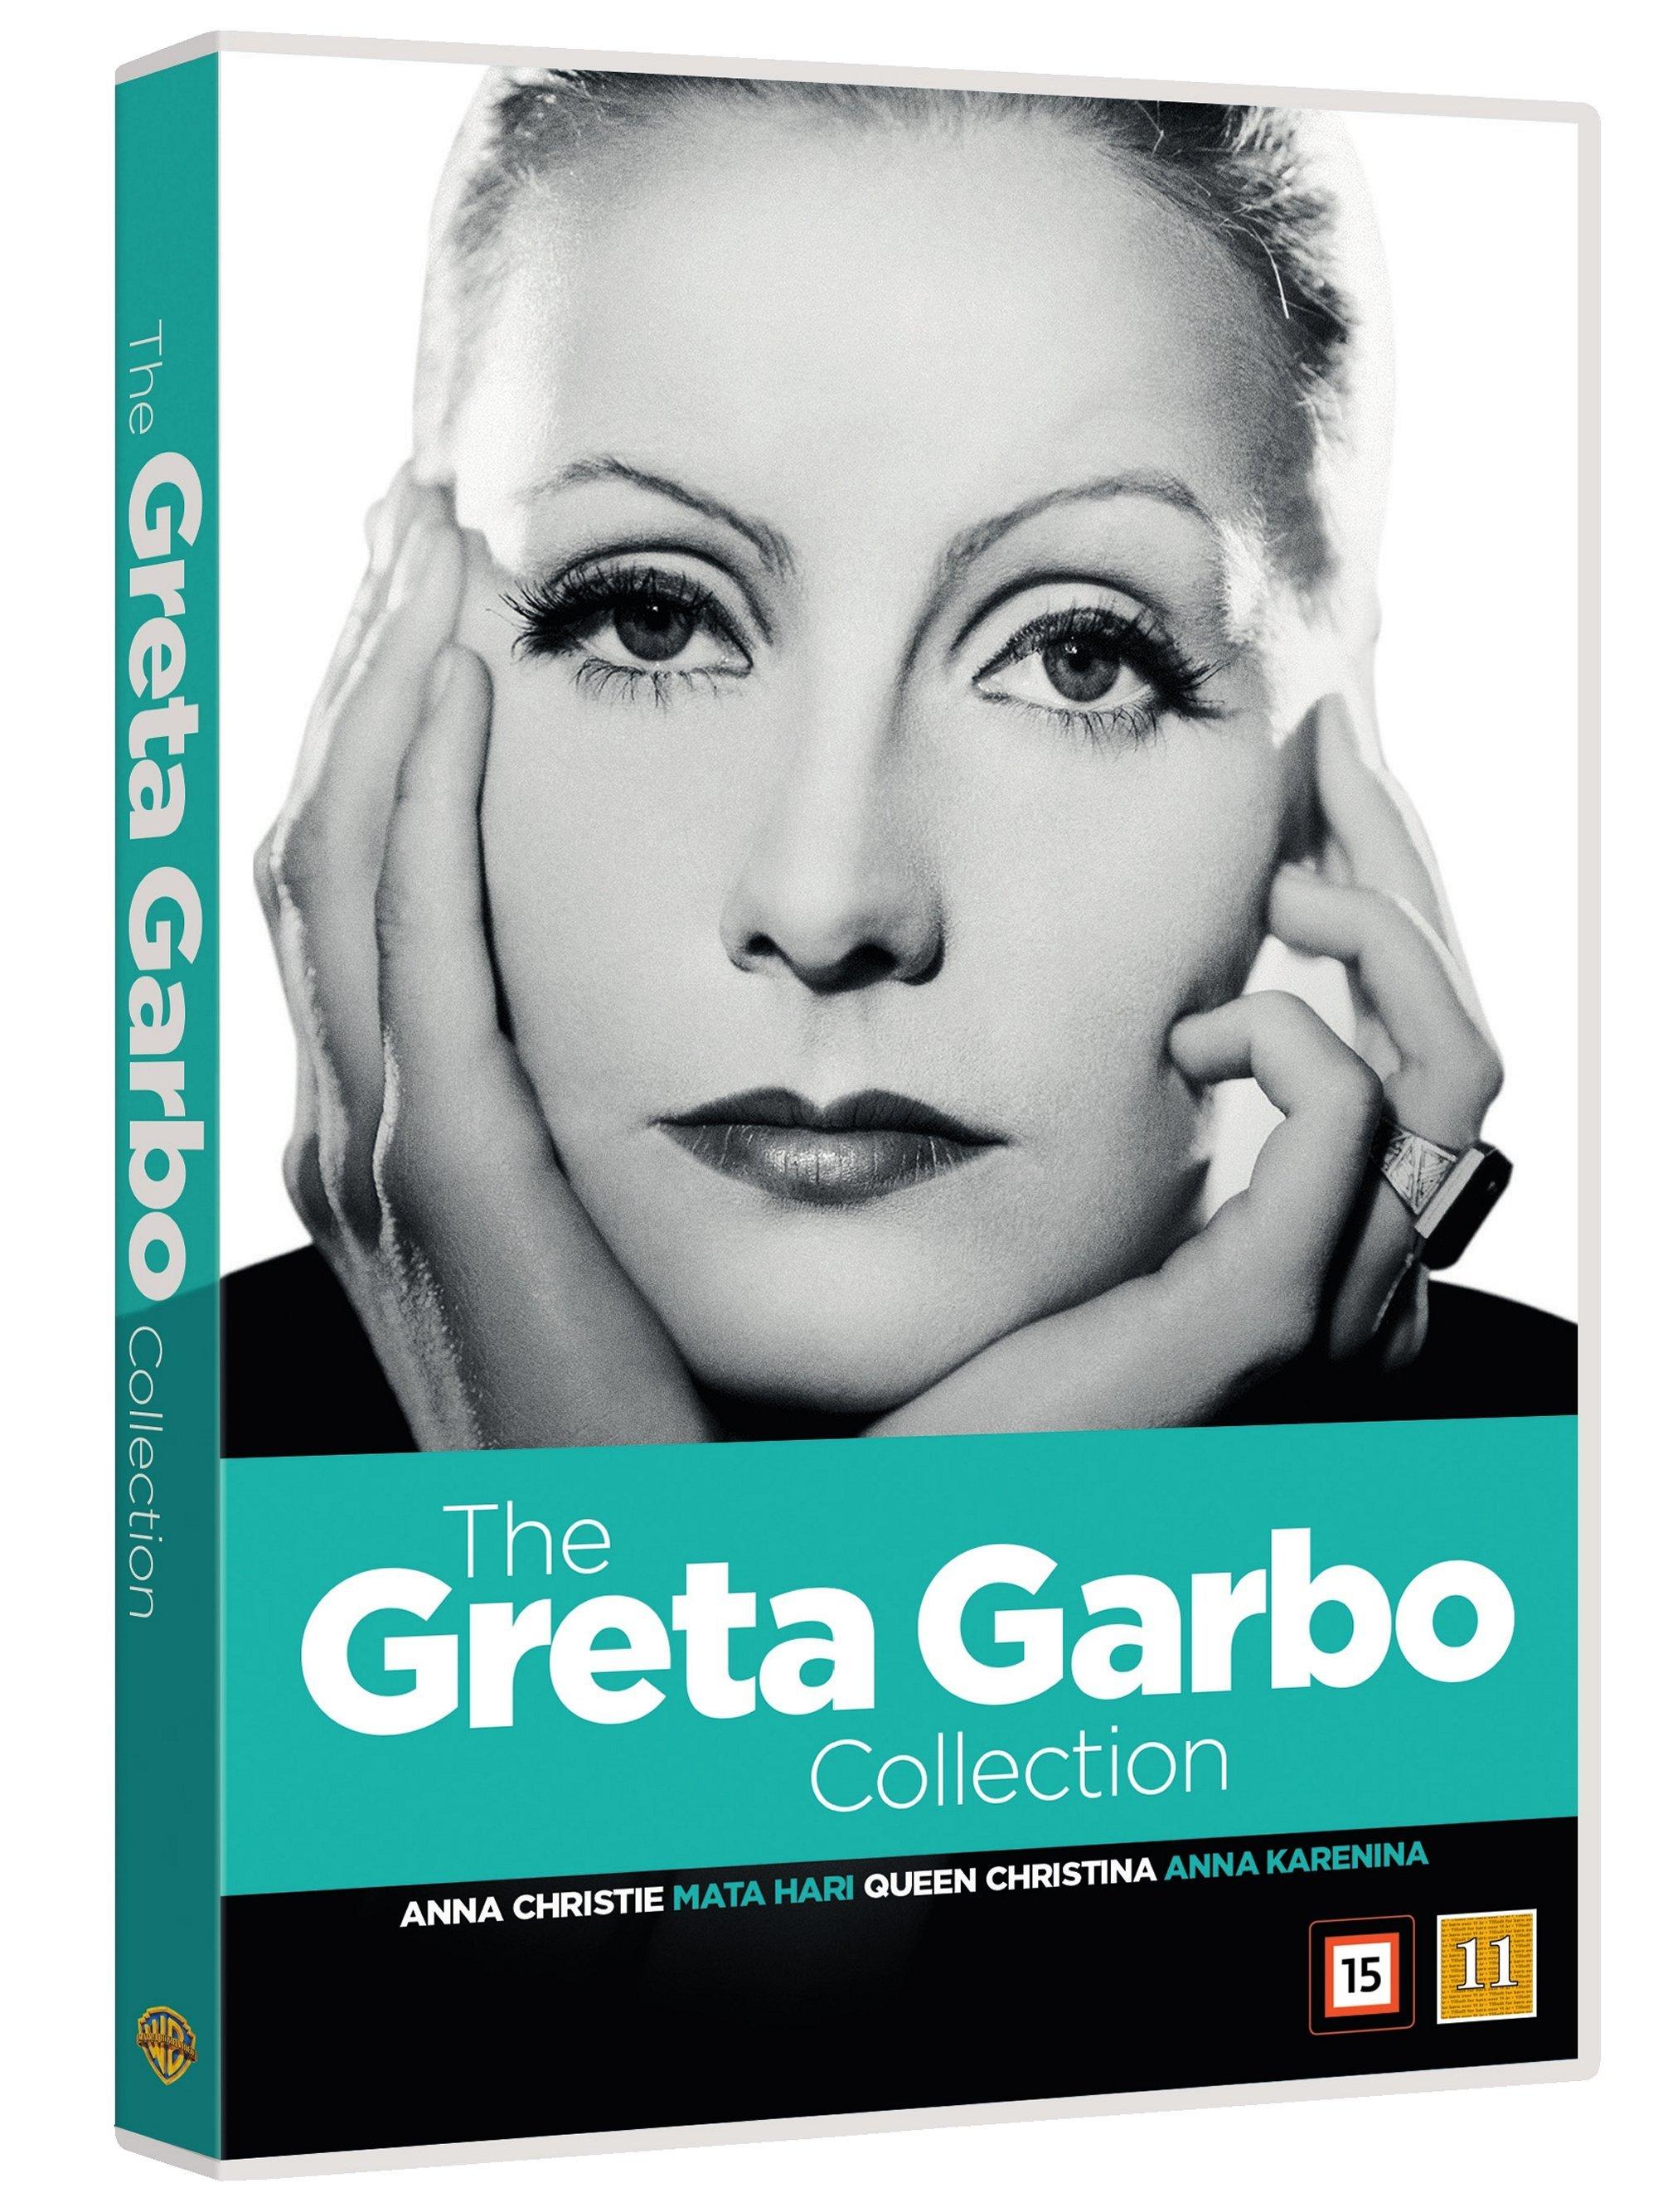 Greta Garbo Collection - DVD